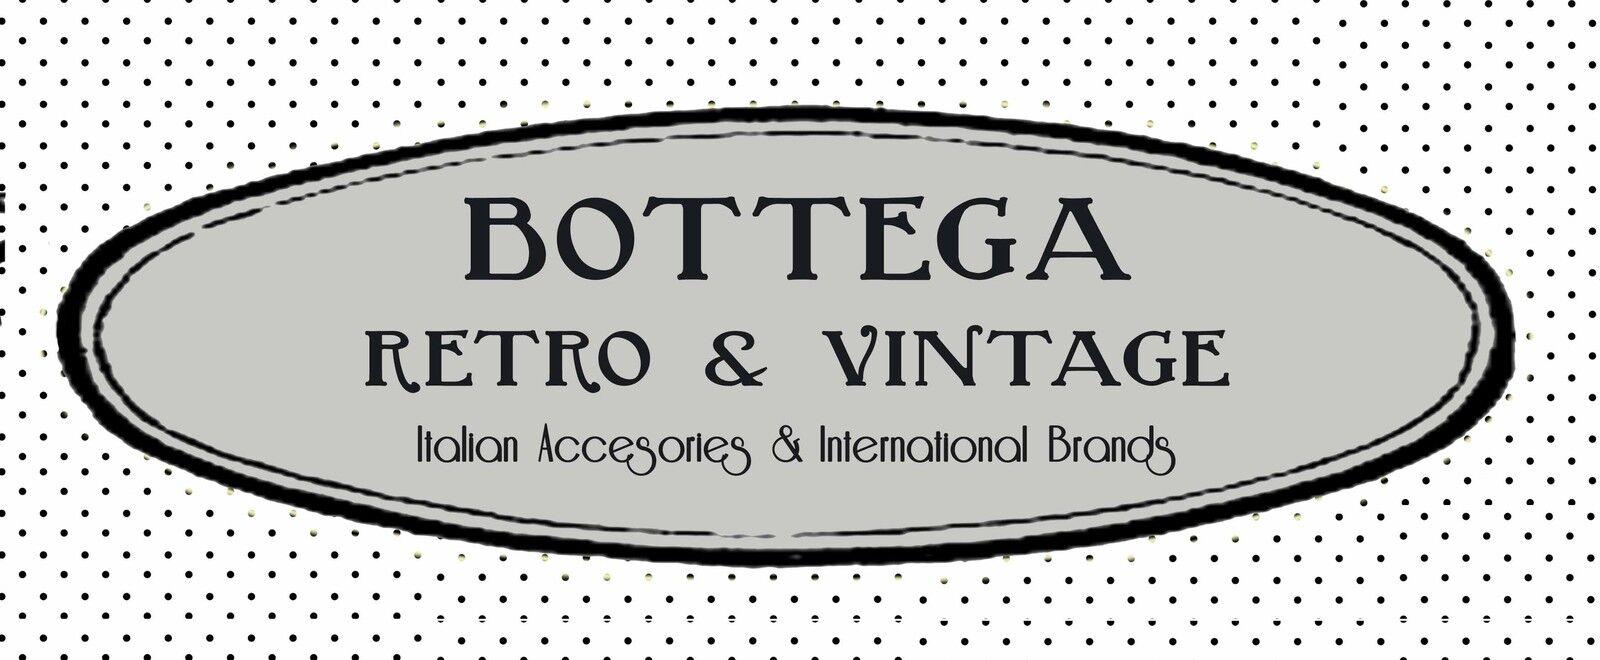 Bottega Retro and Vintage